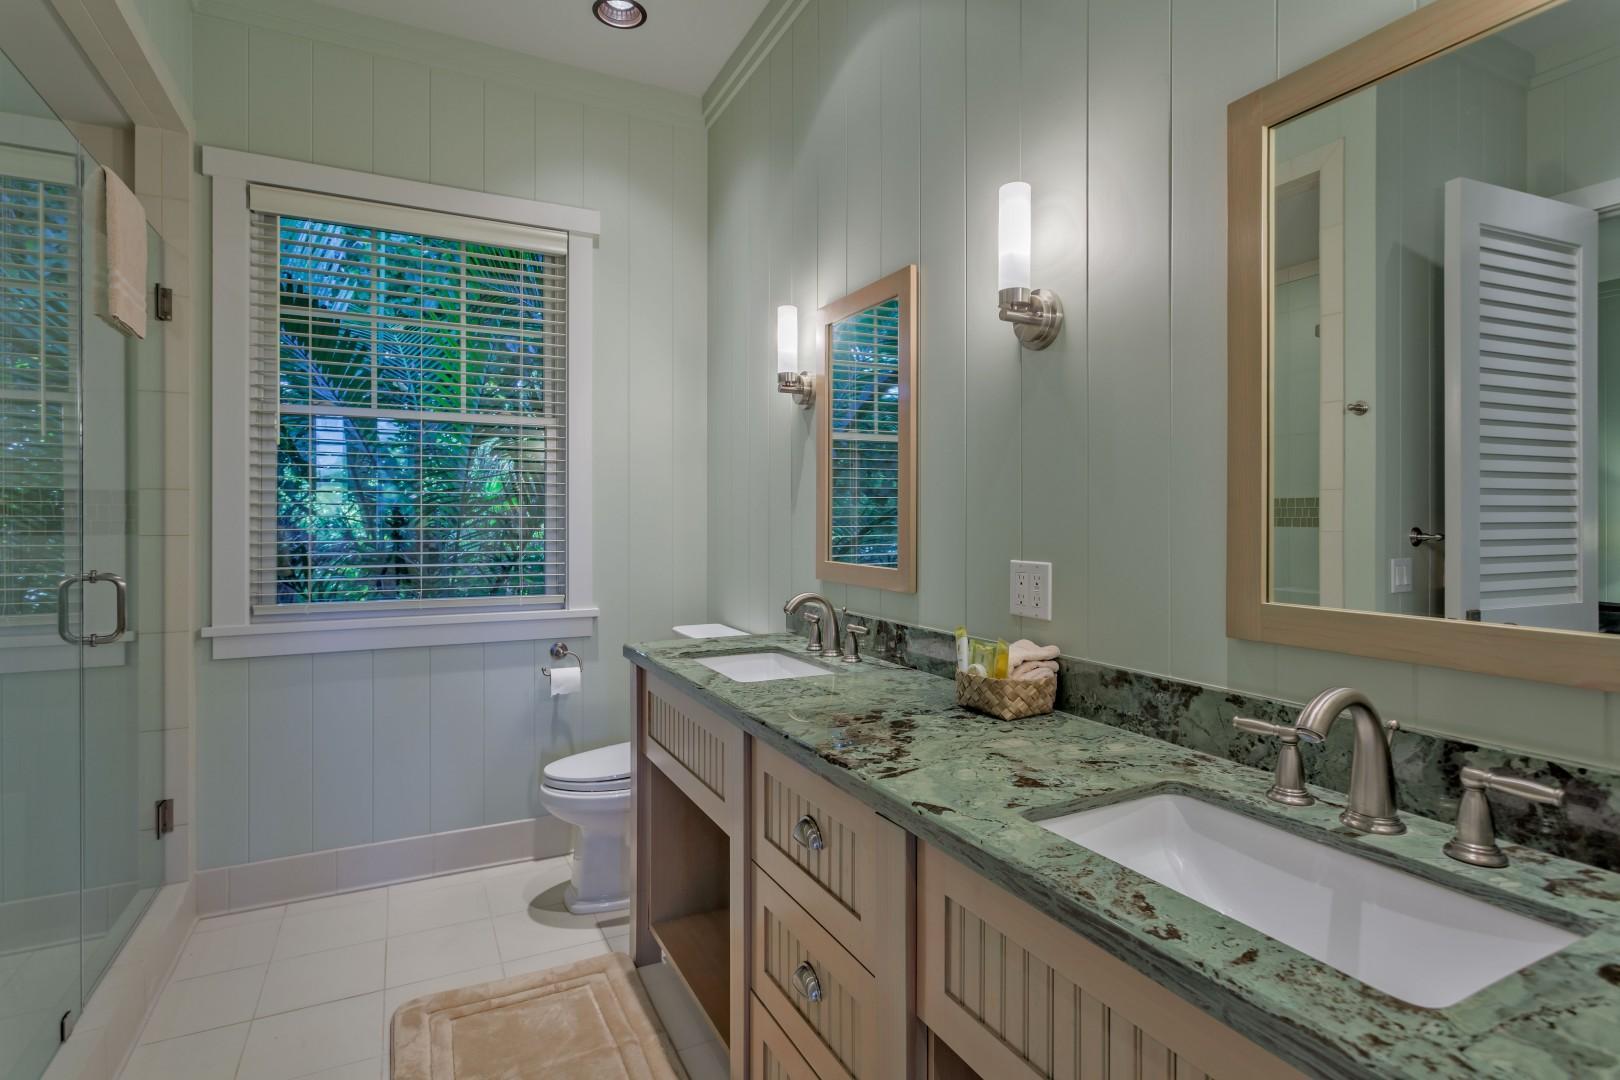 Bathroom 2 w/ Granite Countertops, Double Sink Vanity, Spacious Tiled Shower w/ Two Shower Heads. Two Doors to Bedroom 2 and Hallway.